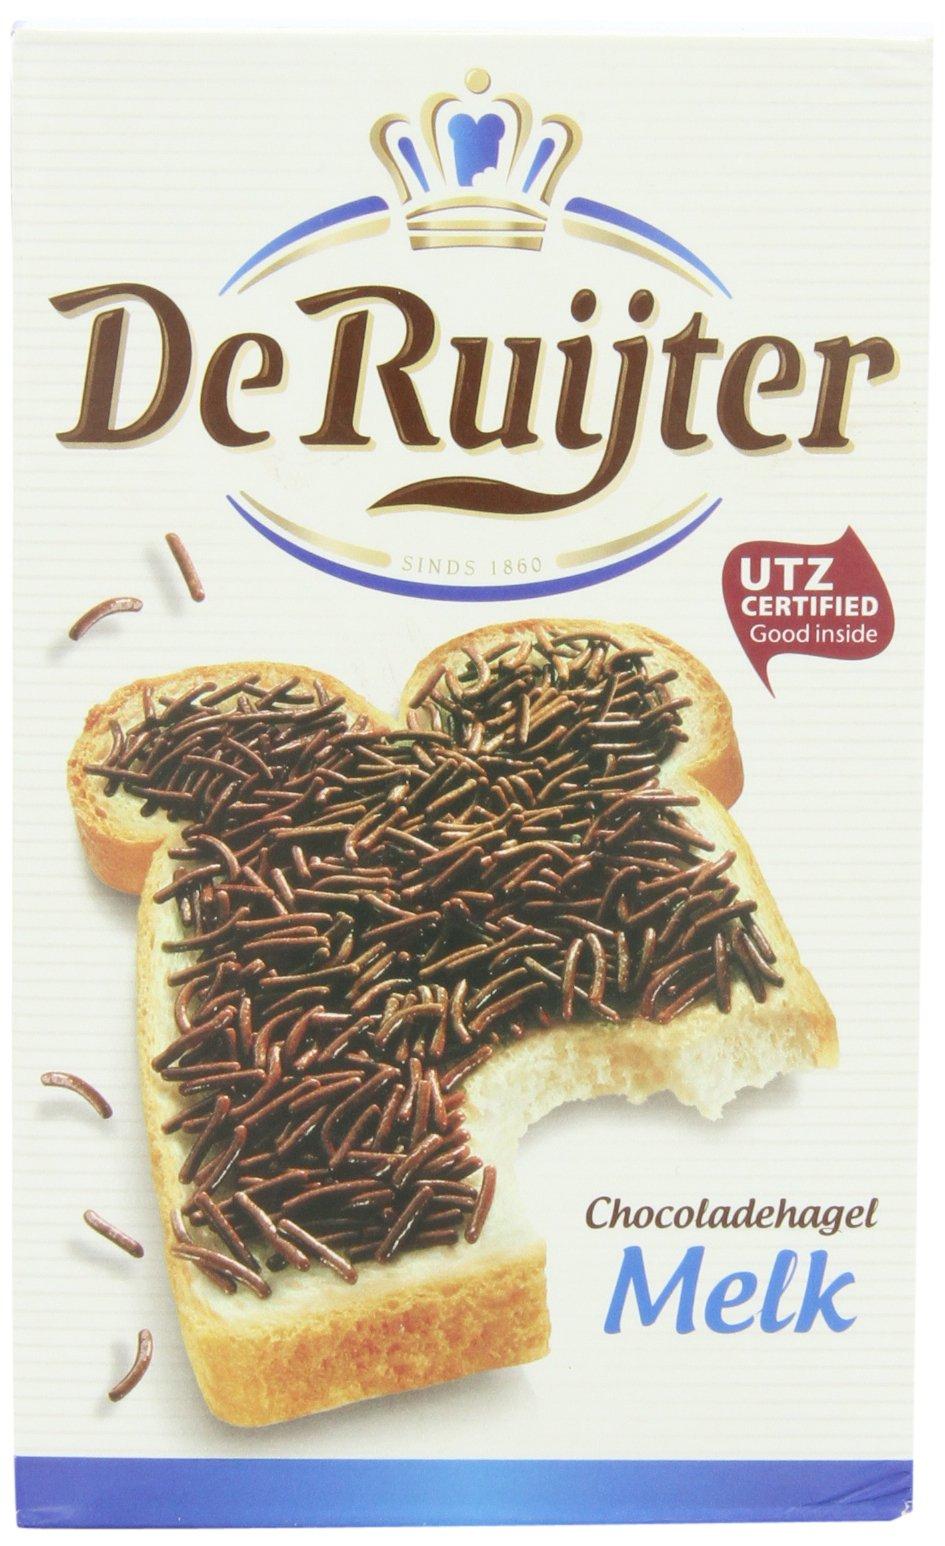 Deruyter Chocoadehagel Melk(Milk Chocolate Sprinkles), 14-Ounce Boxes (Pack of 3)